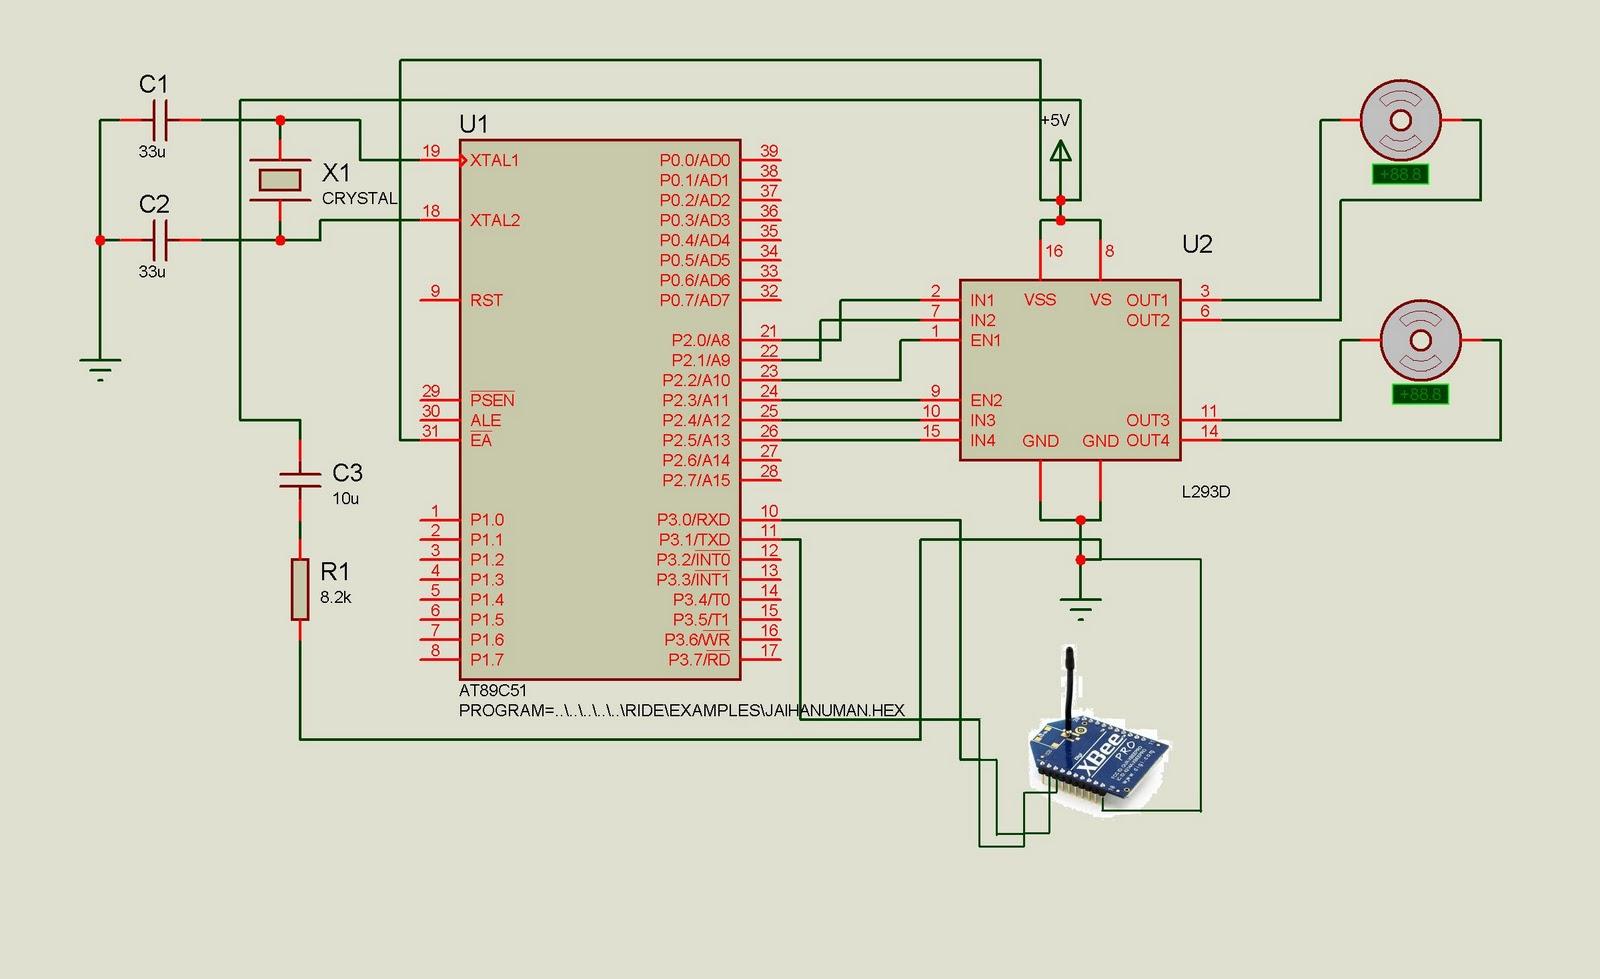 zigbee based projects rh zigbee projects blogspot com Transformer Circuit Diagram Battery Circuit Diagram